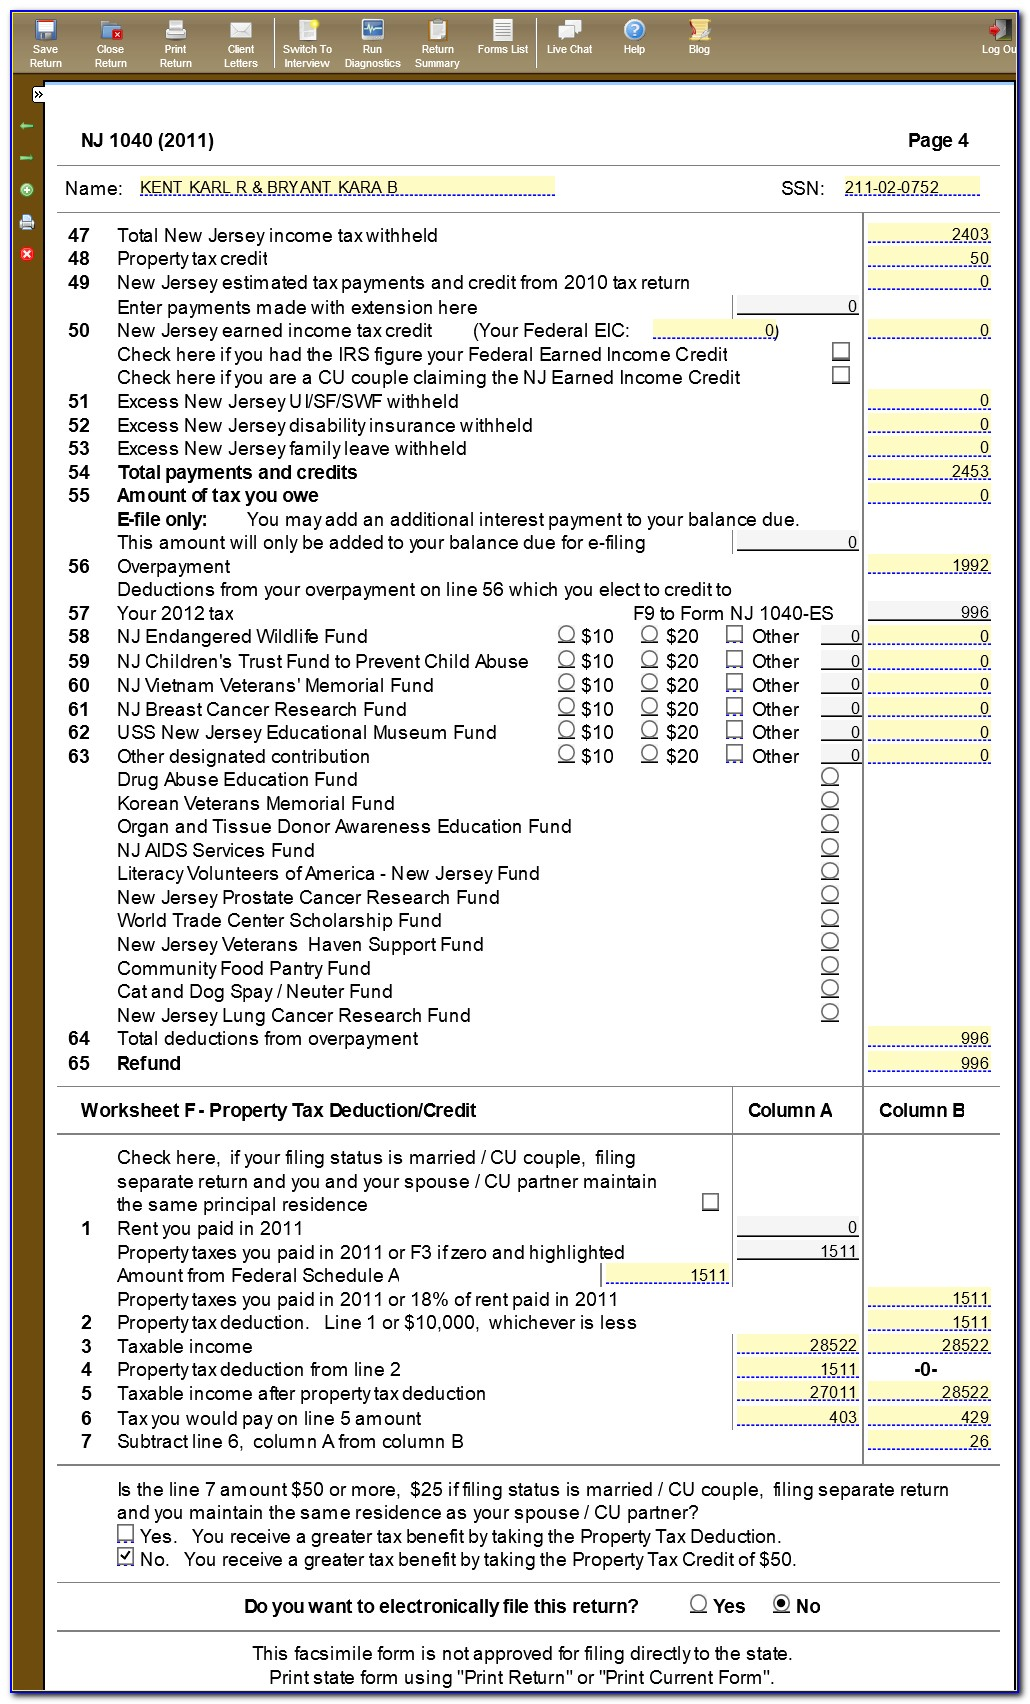 Nj 1040 Tax Form Instructions